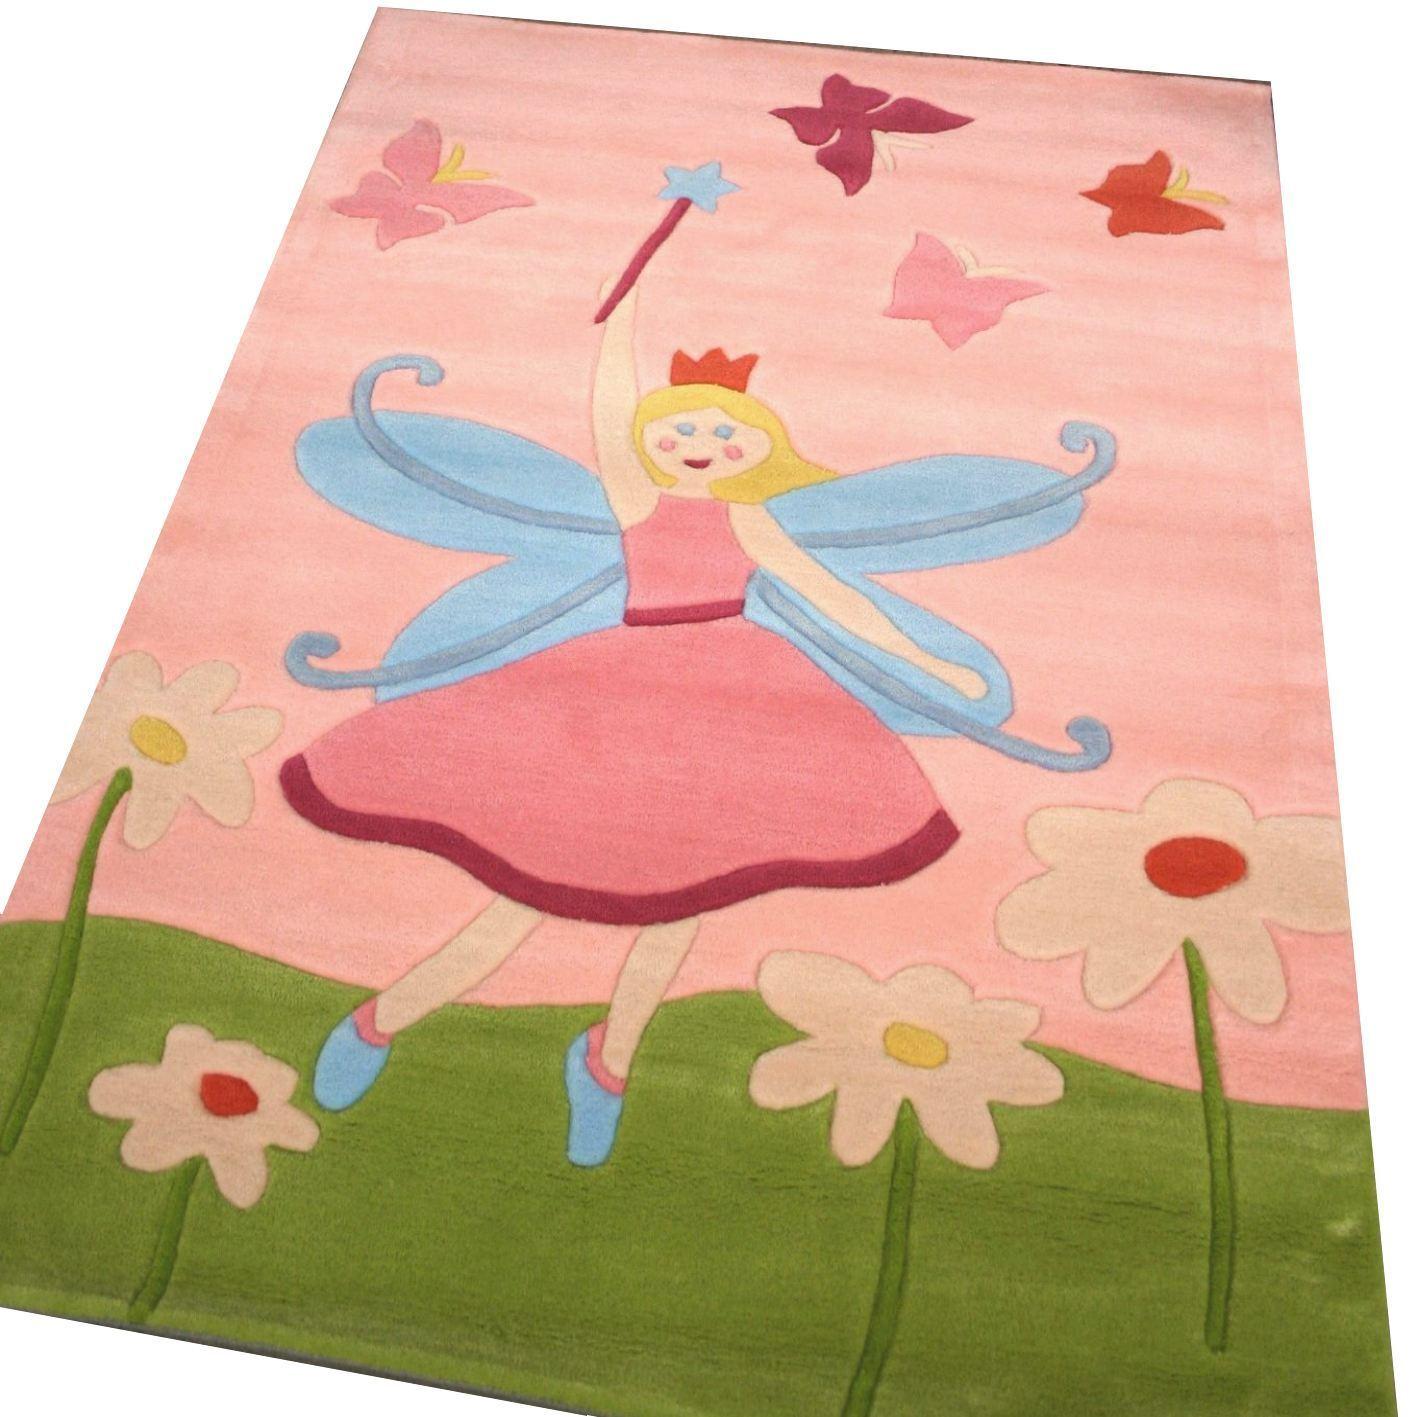 ARTE ESPINA Teppich Handtuft 4053-44 FEE 110x160 cm NEU | Kunde zuerst